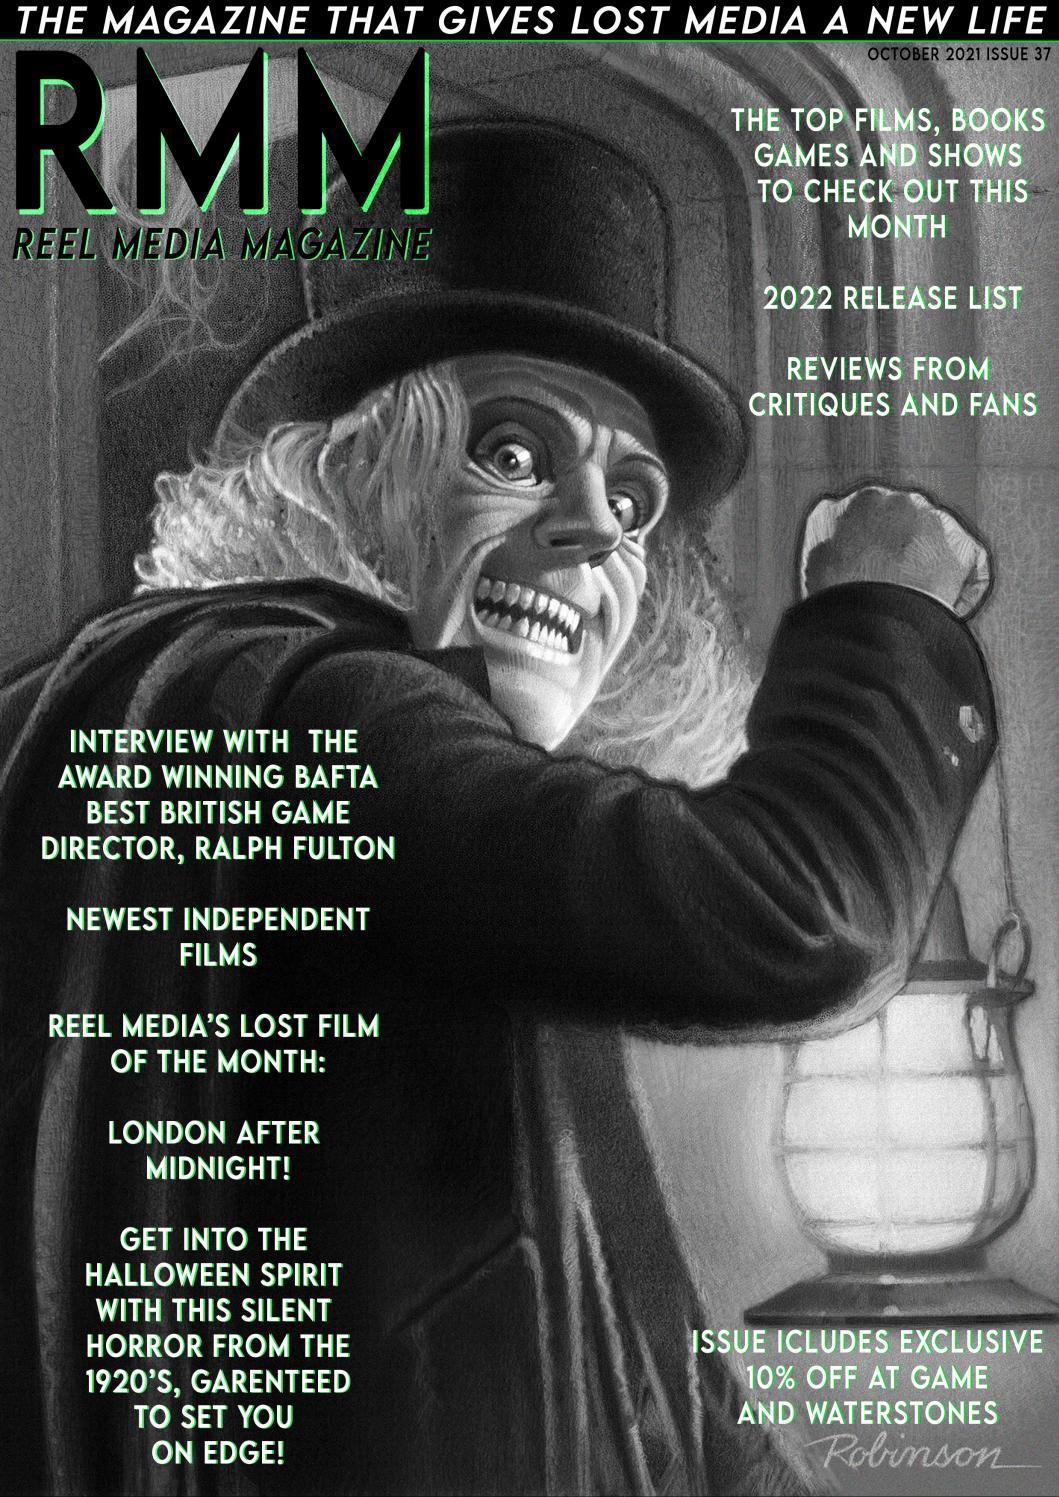 Reel Media Magazine (RRM) October 2021